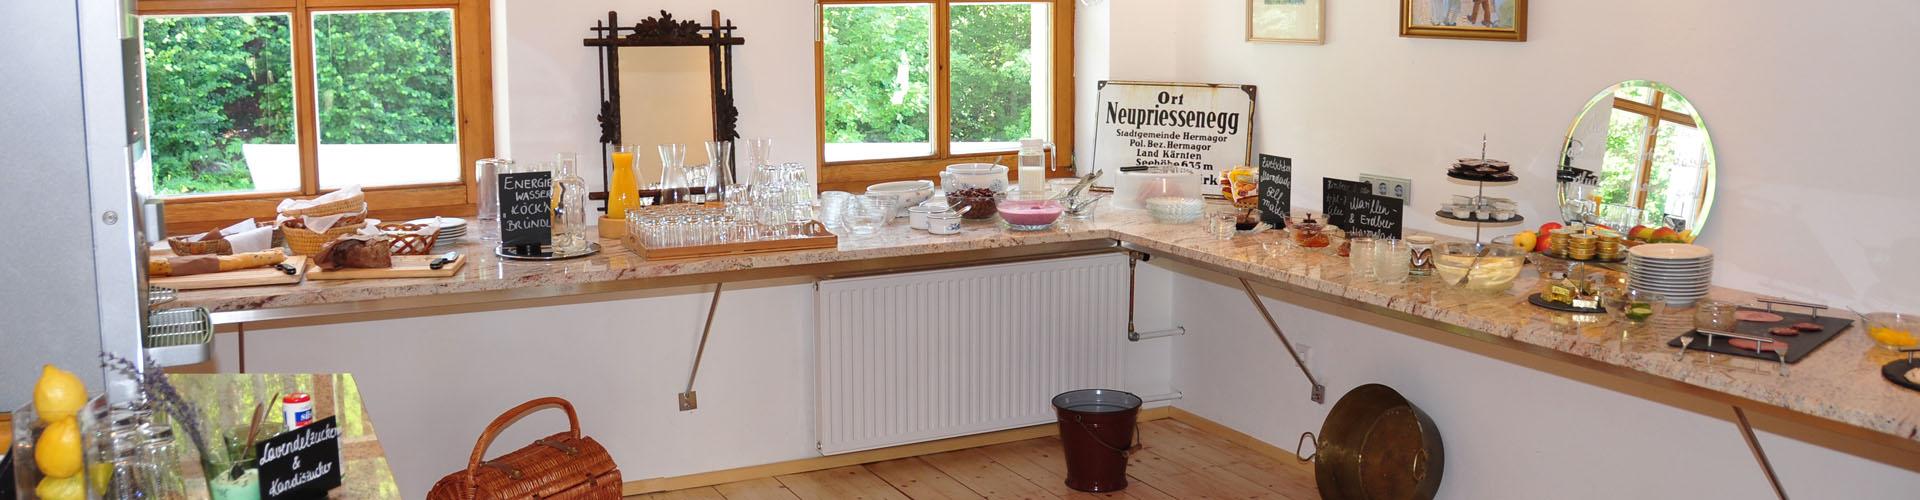 frühstücksbuffet-frühstückspension-hermagor-nassfeld